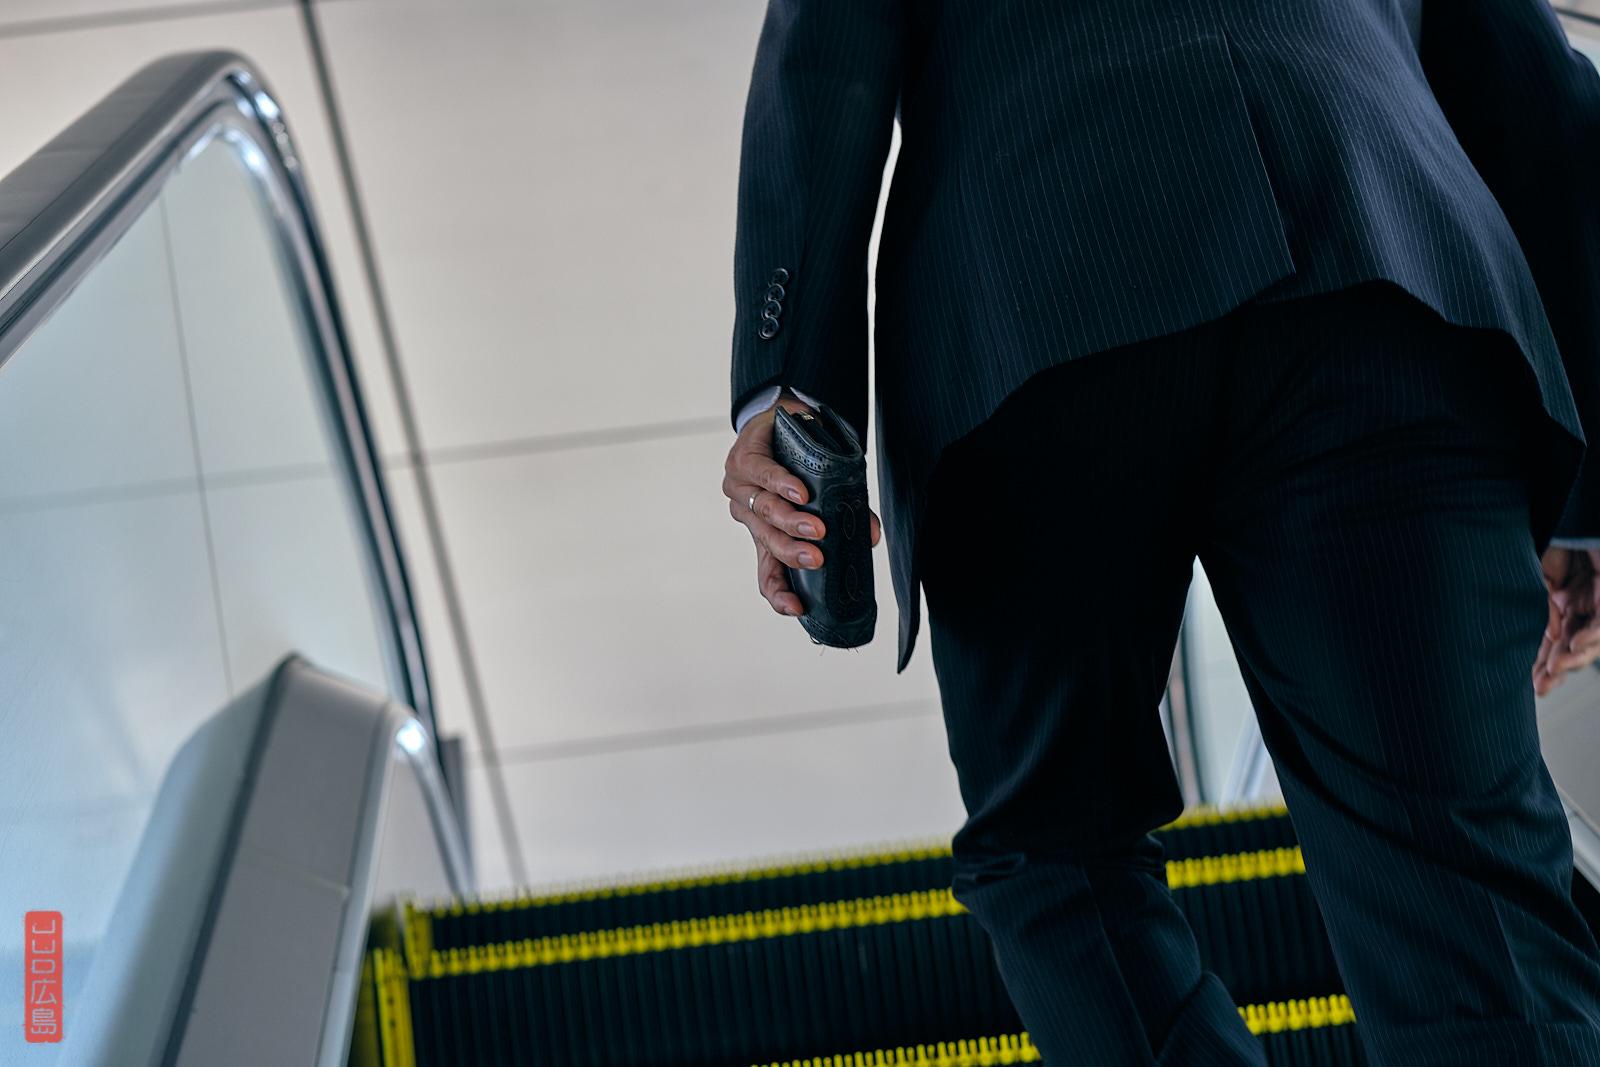 Salaryman dans un escalator, gare d'Hiroshima, Japon